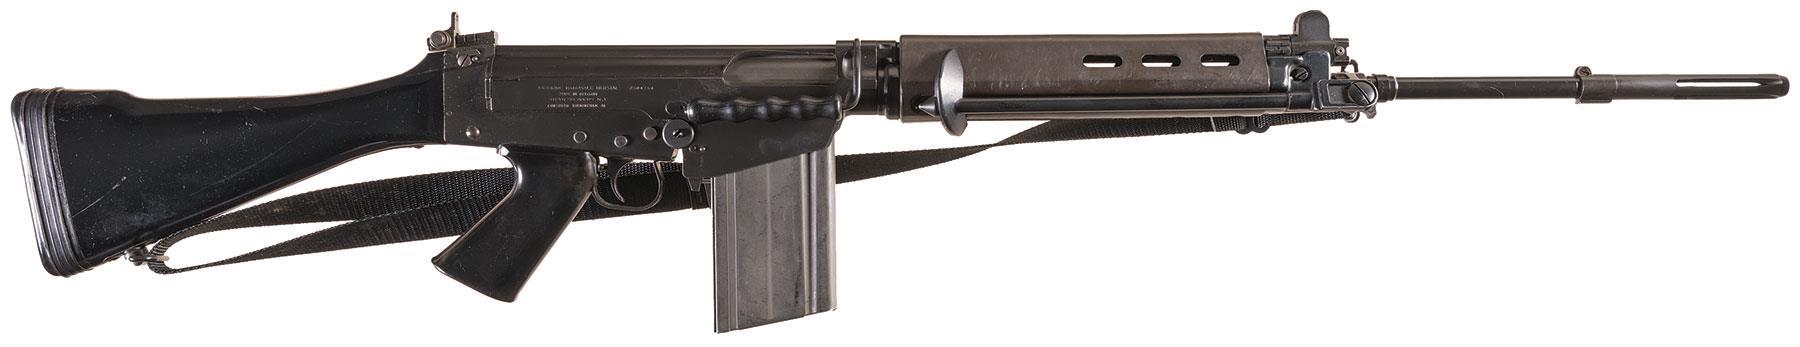 Belgian Fabrique Nationale FAL Semi-Automatic Rifle